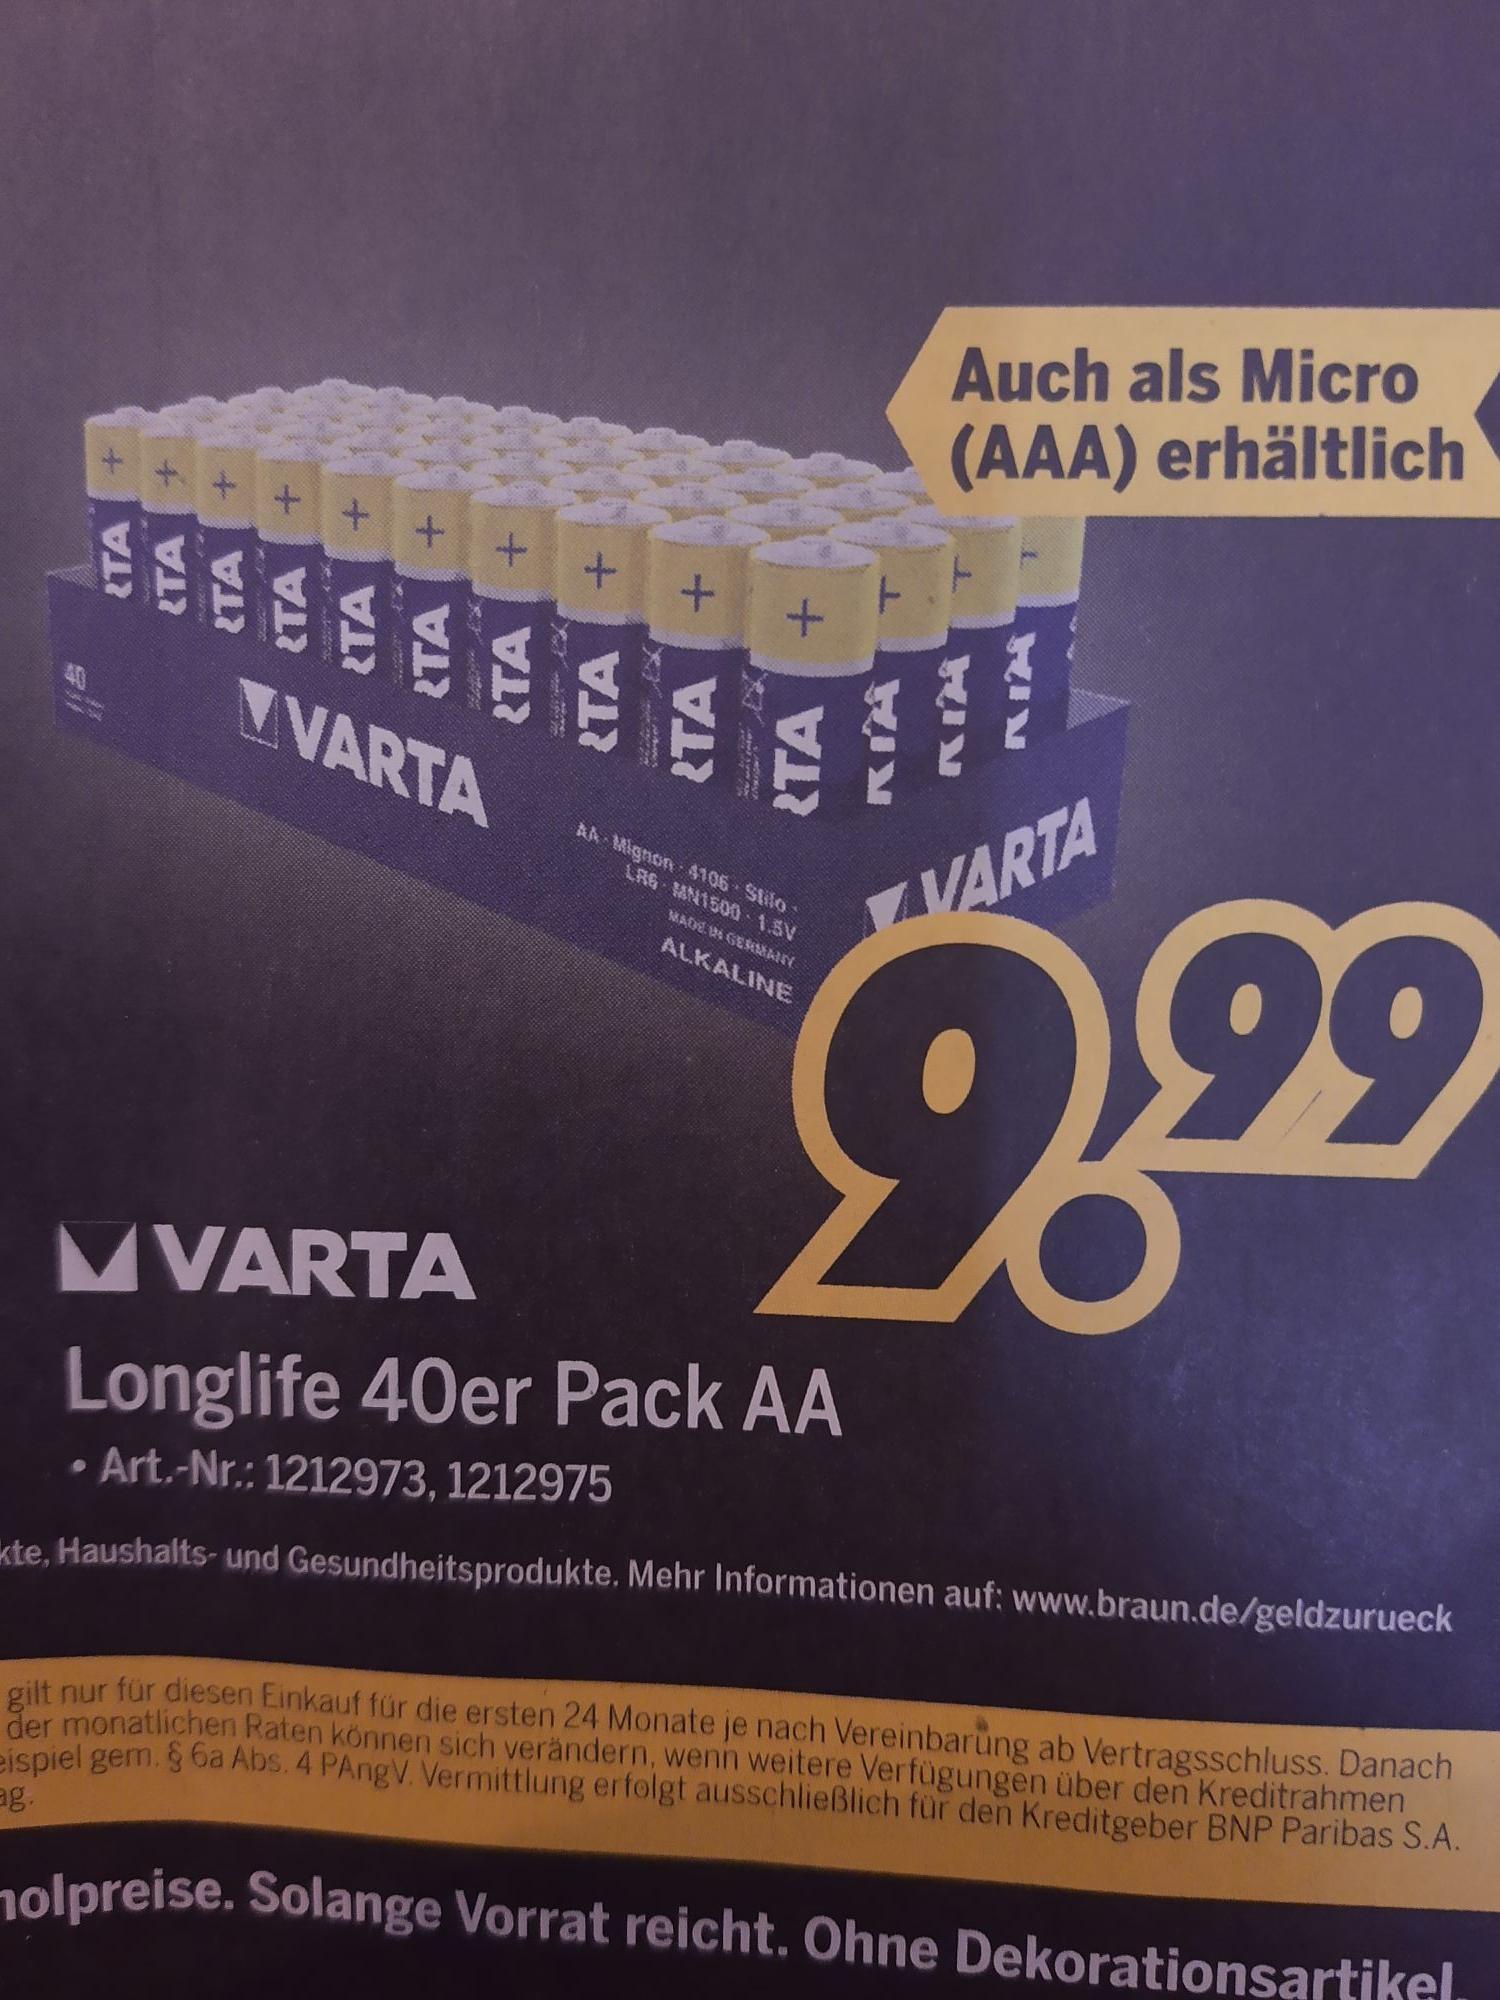 [MEDIMAX Lokal?] XXXL-Box (40 Stk) Varta 4106 Longlife Batterie 1,5V AAA Micro / 1,5V AA Mignon